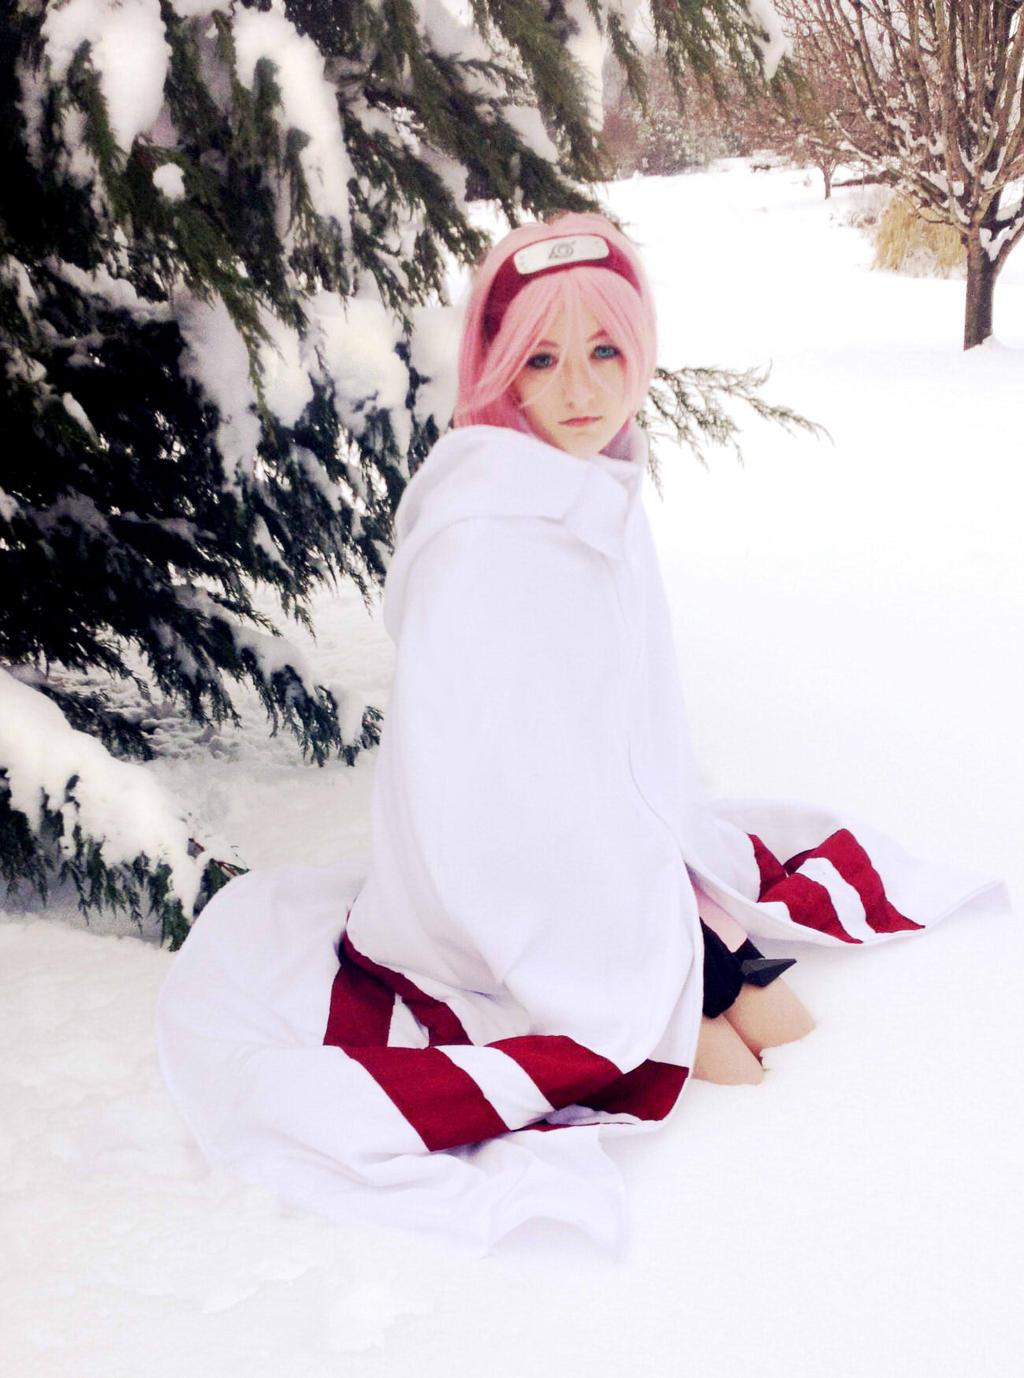 Sakura in winter 1 by JeiGoWAY